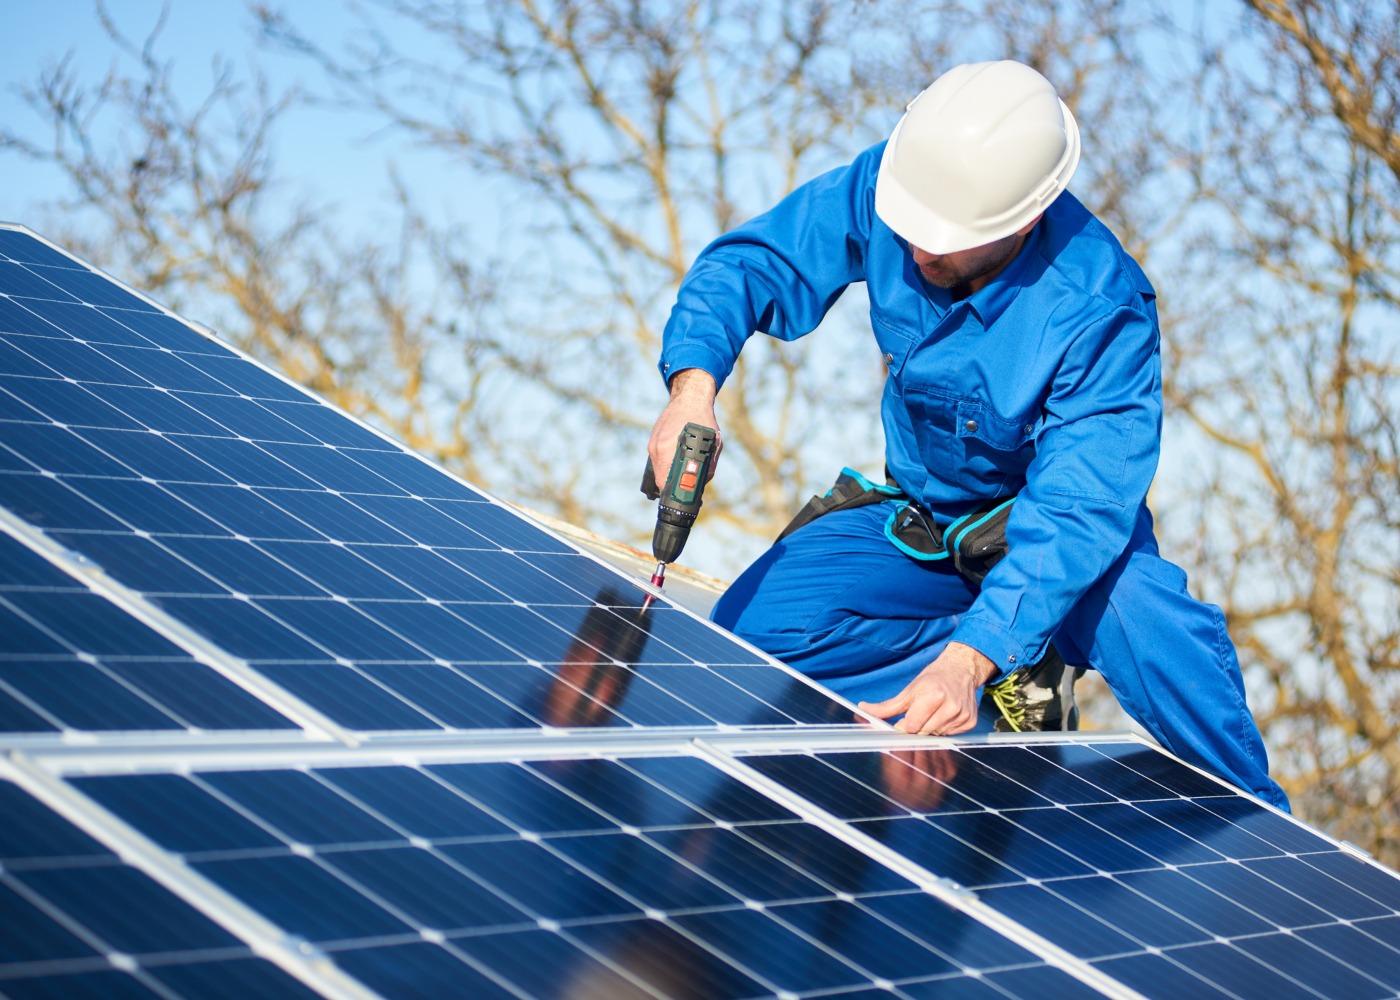 homem a instalar painéis solares